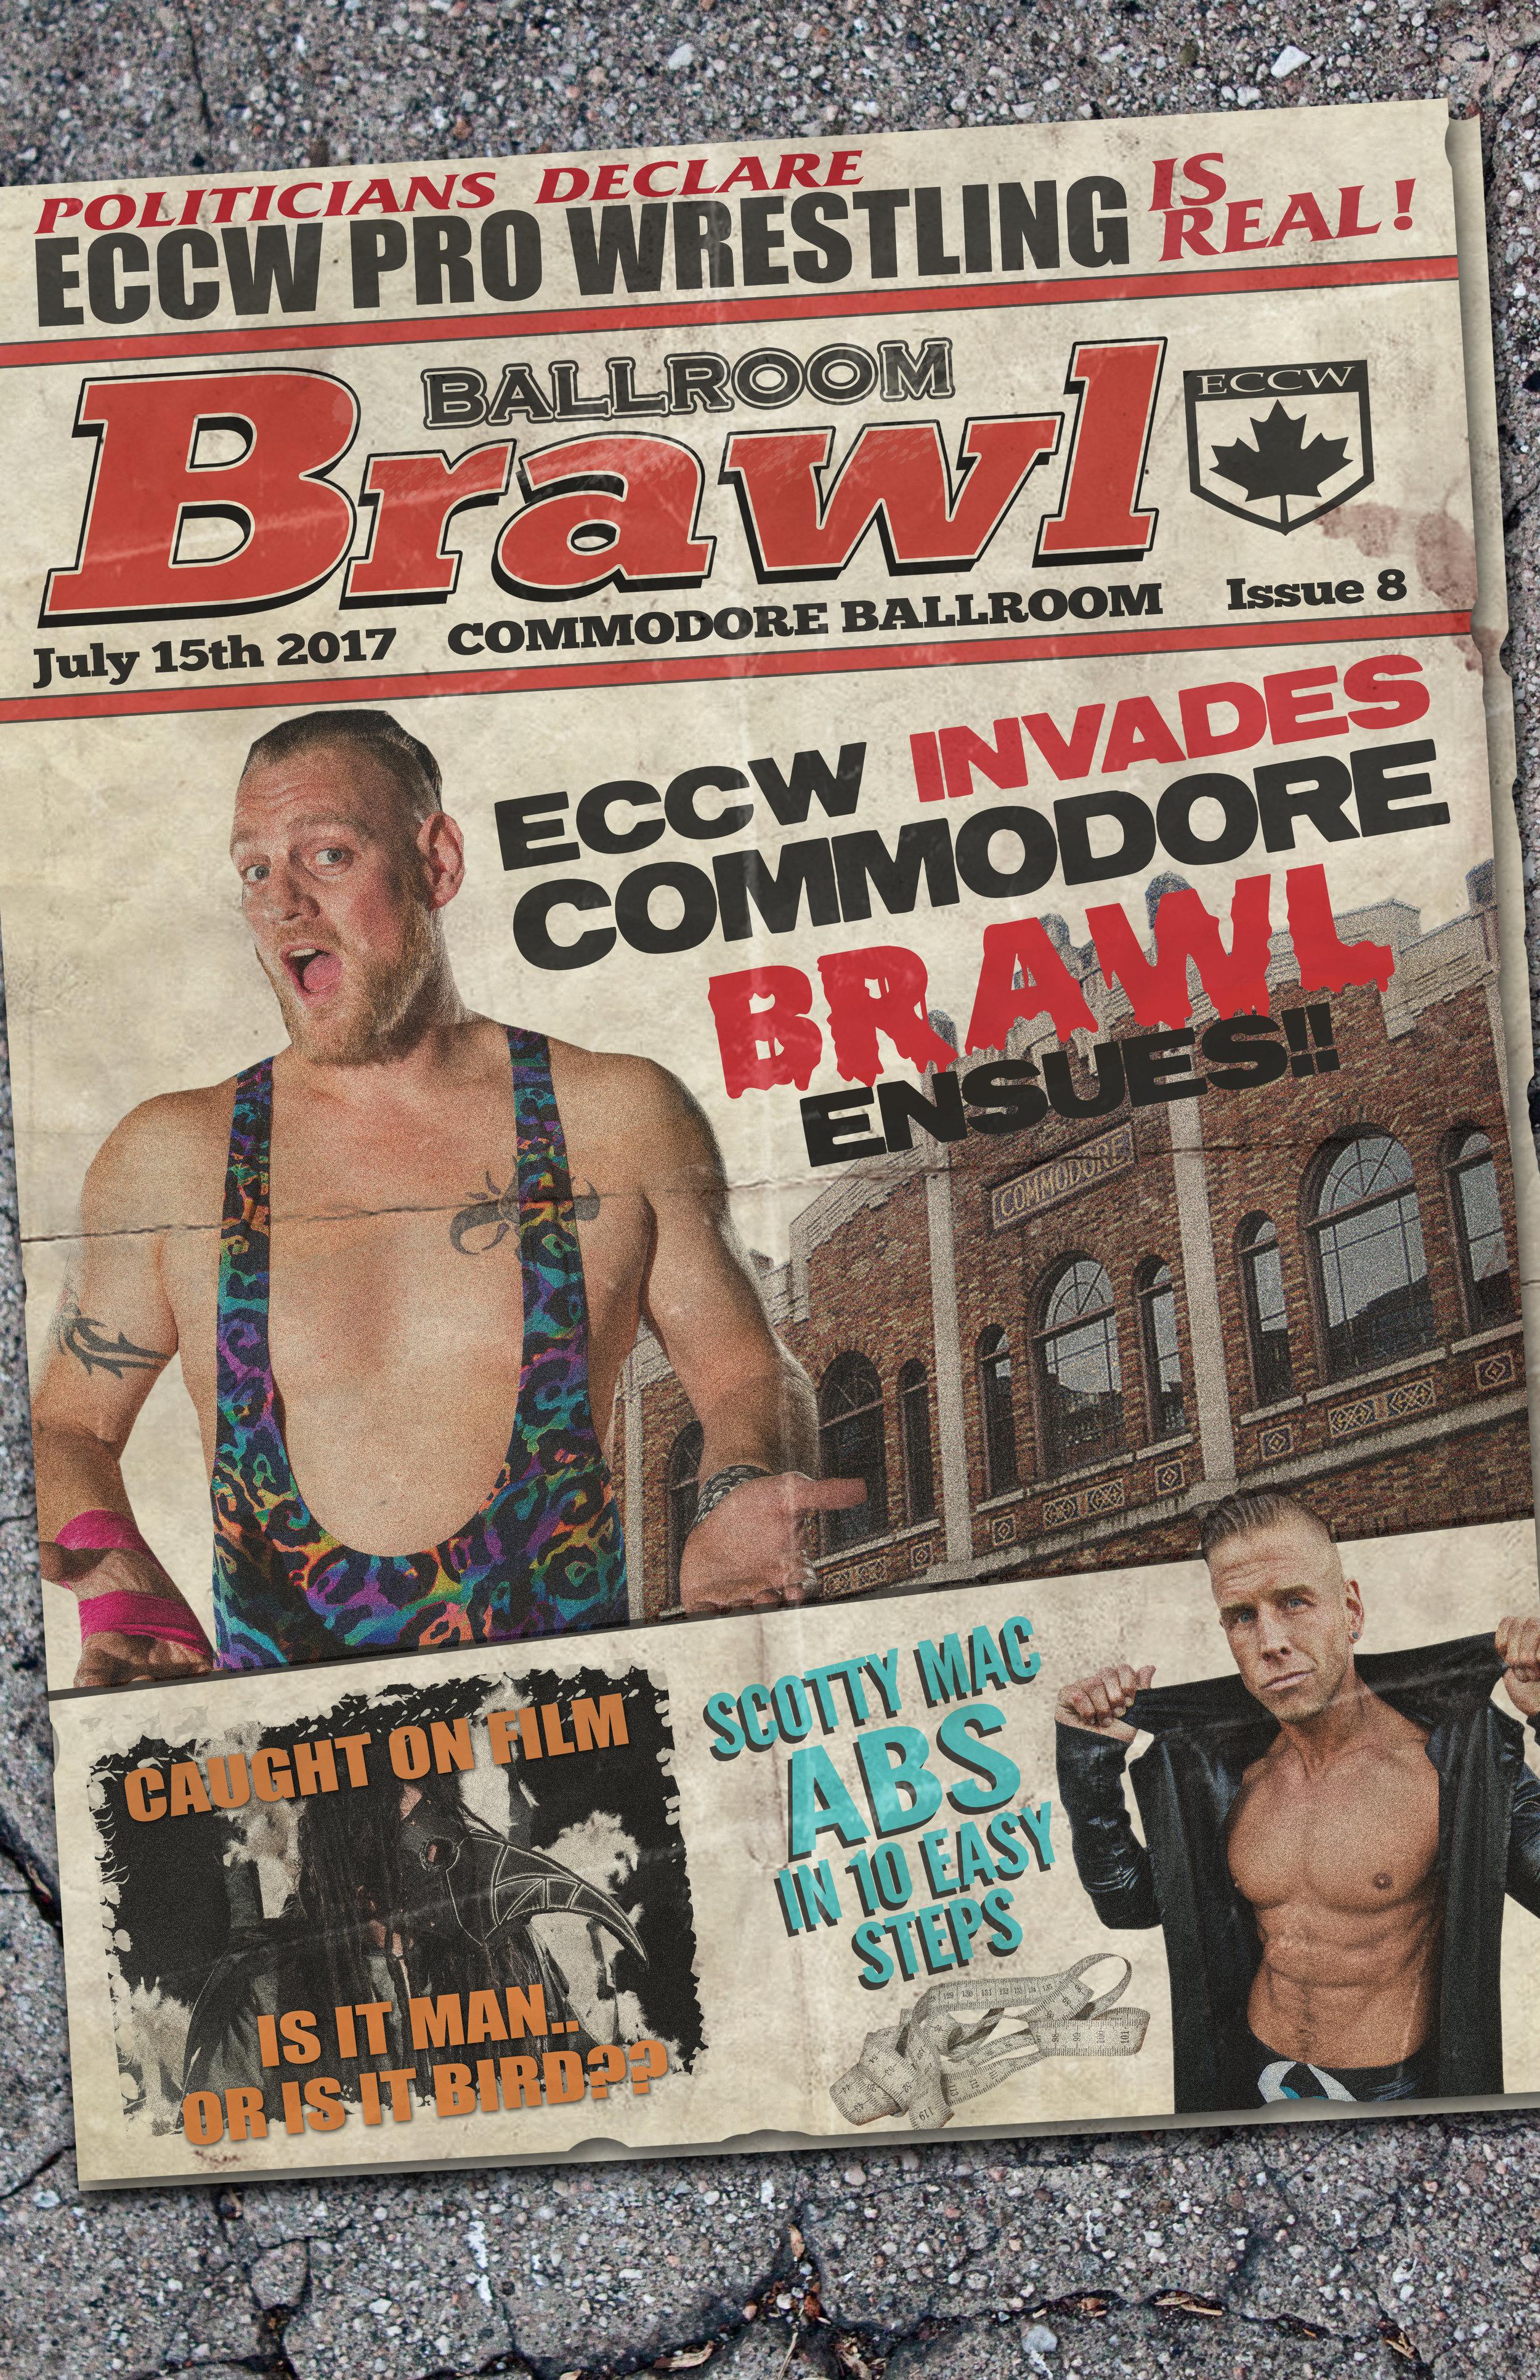 eccw ballroom brawl 8 teaser poster.jpg